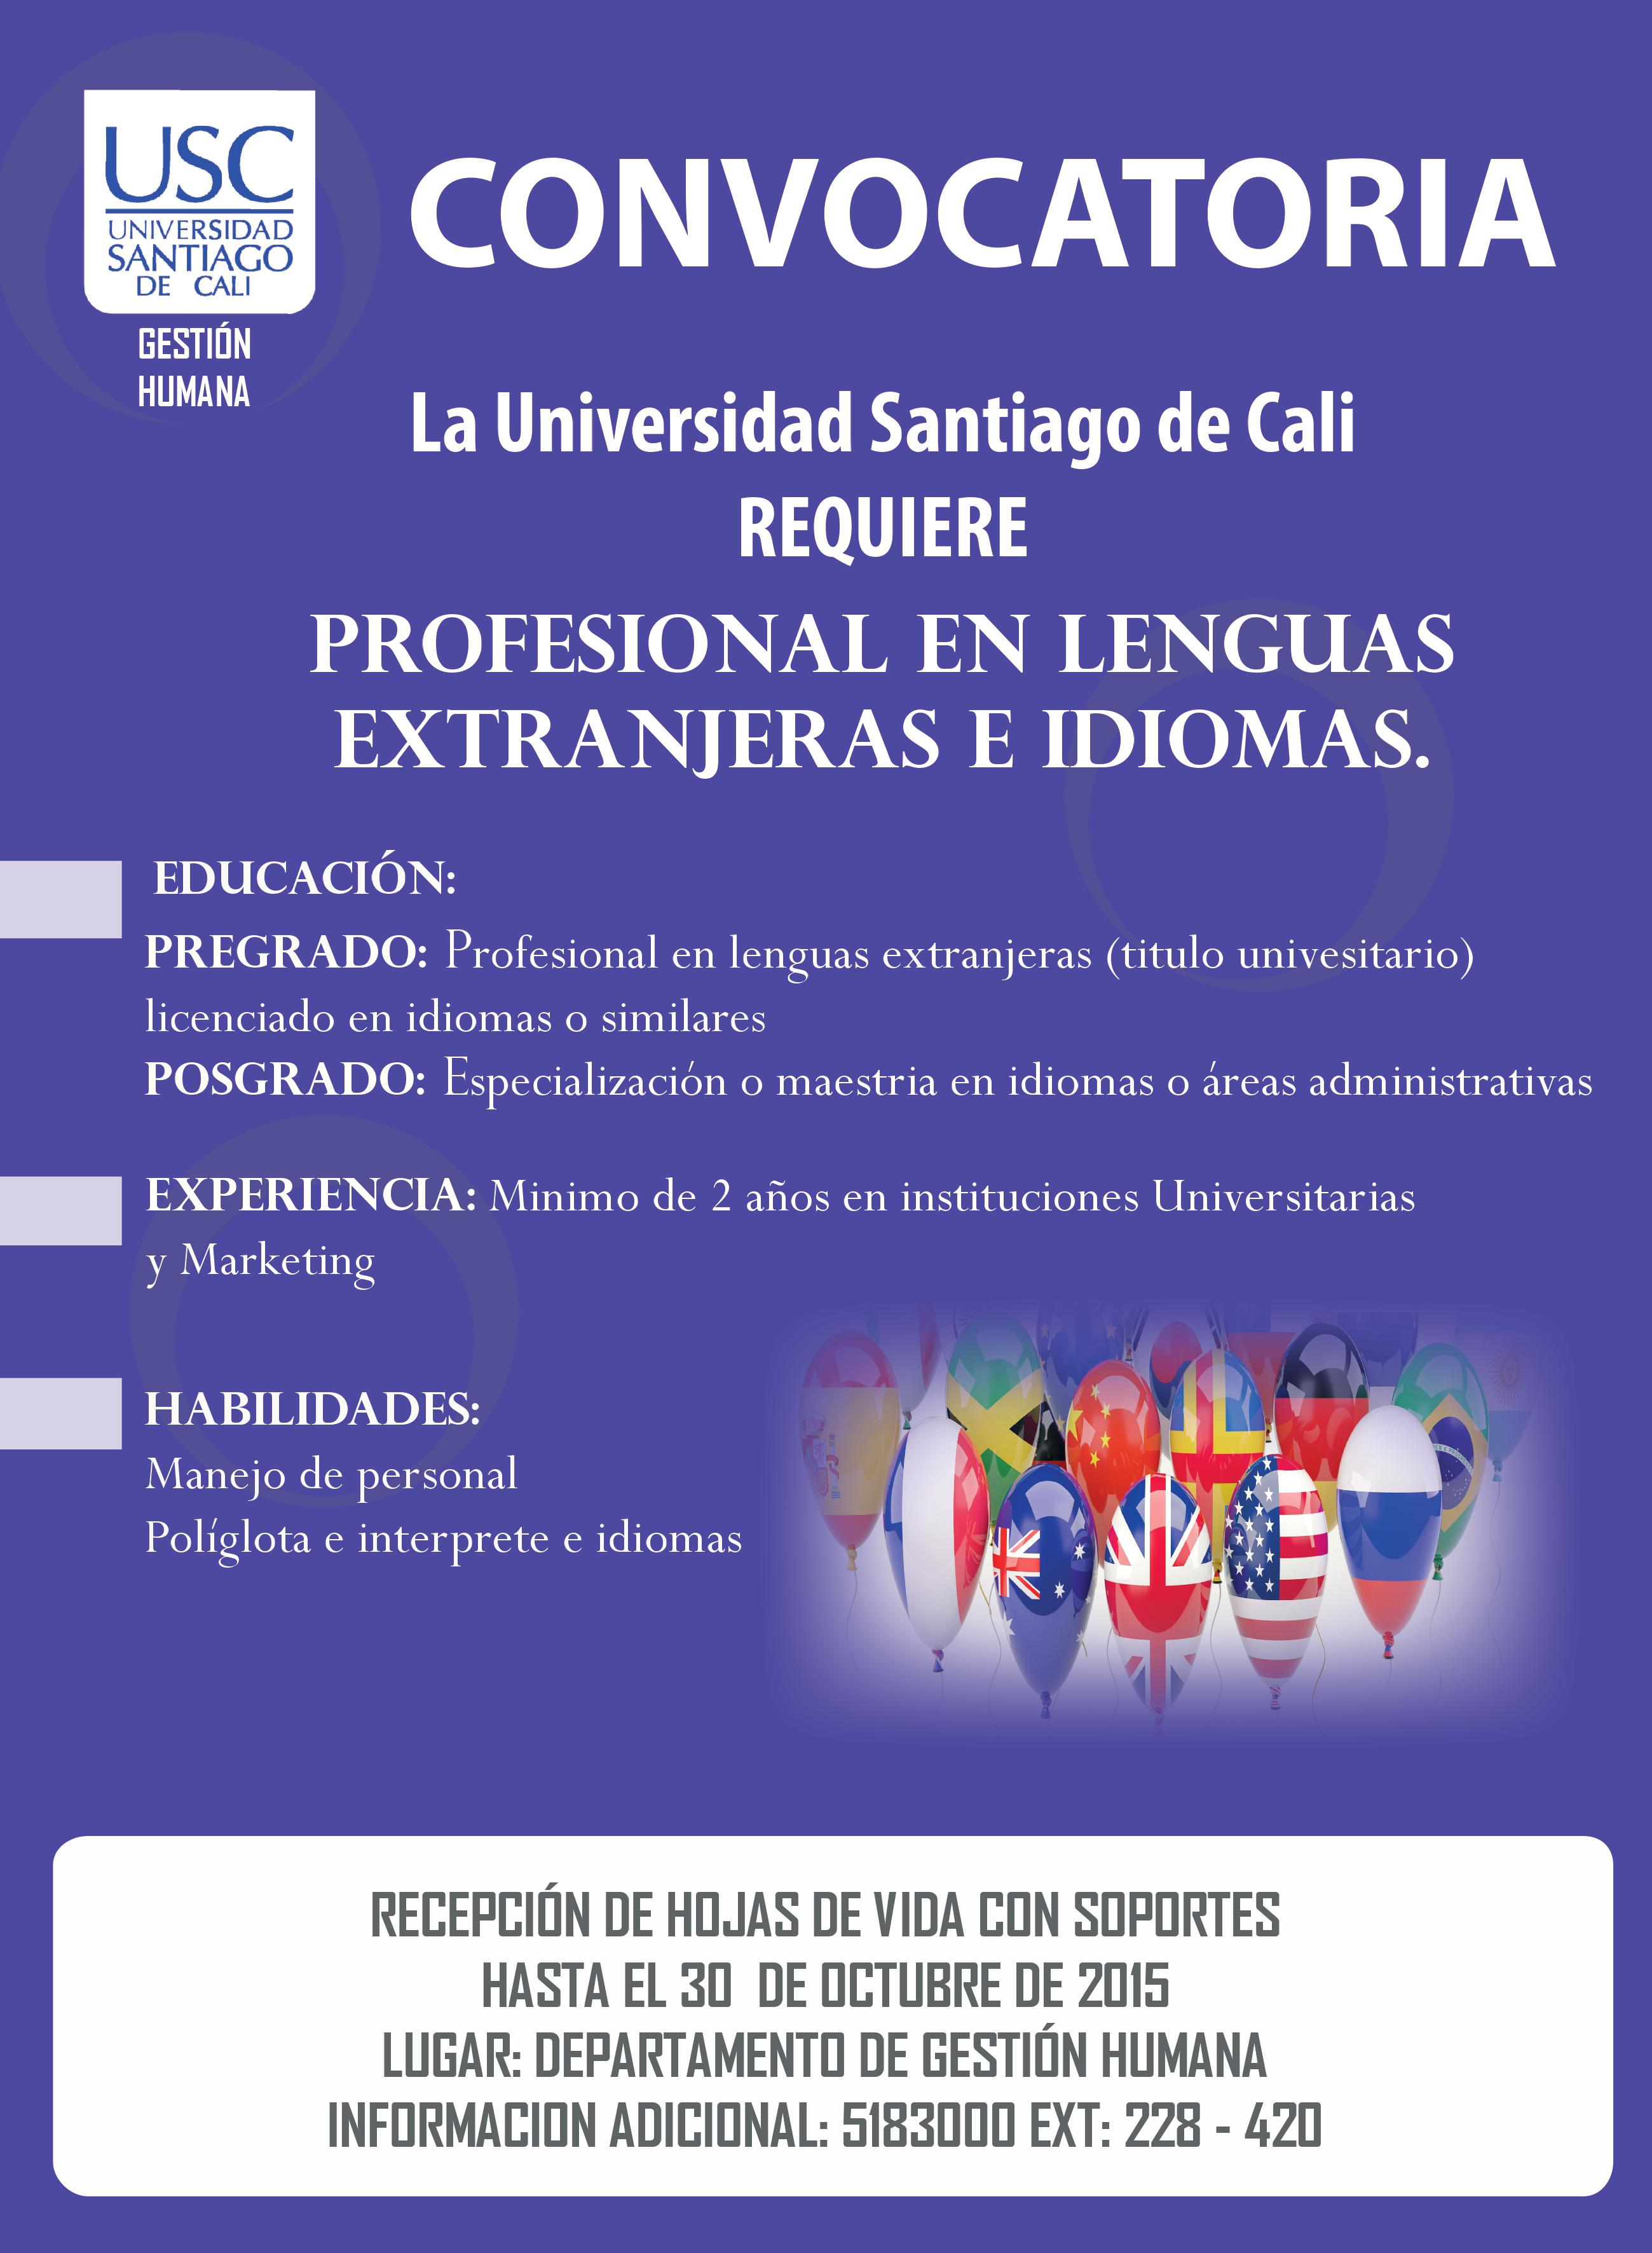 PROFESIONAL EN LENGUAS EXTRANJERAS